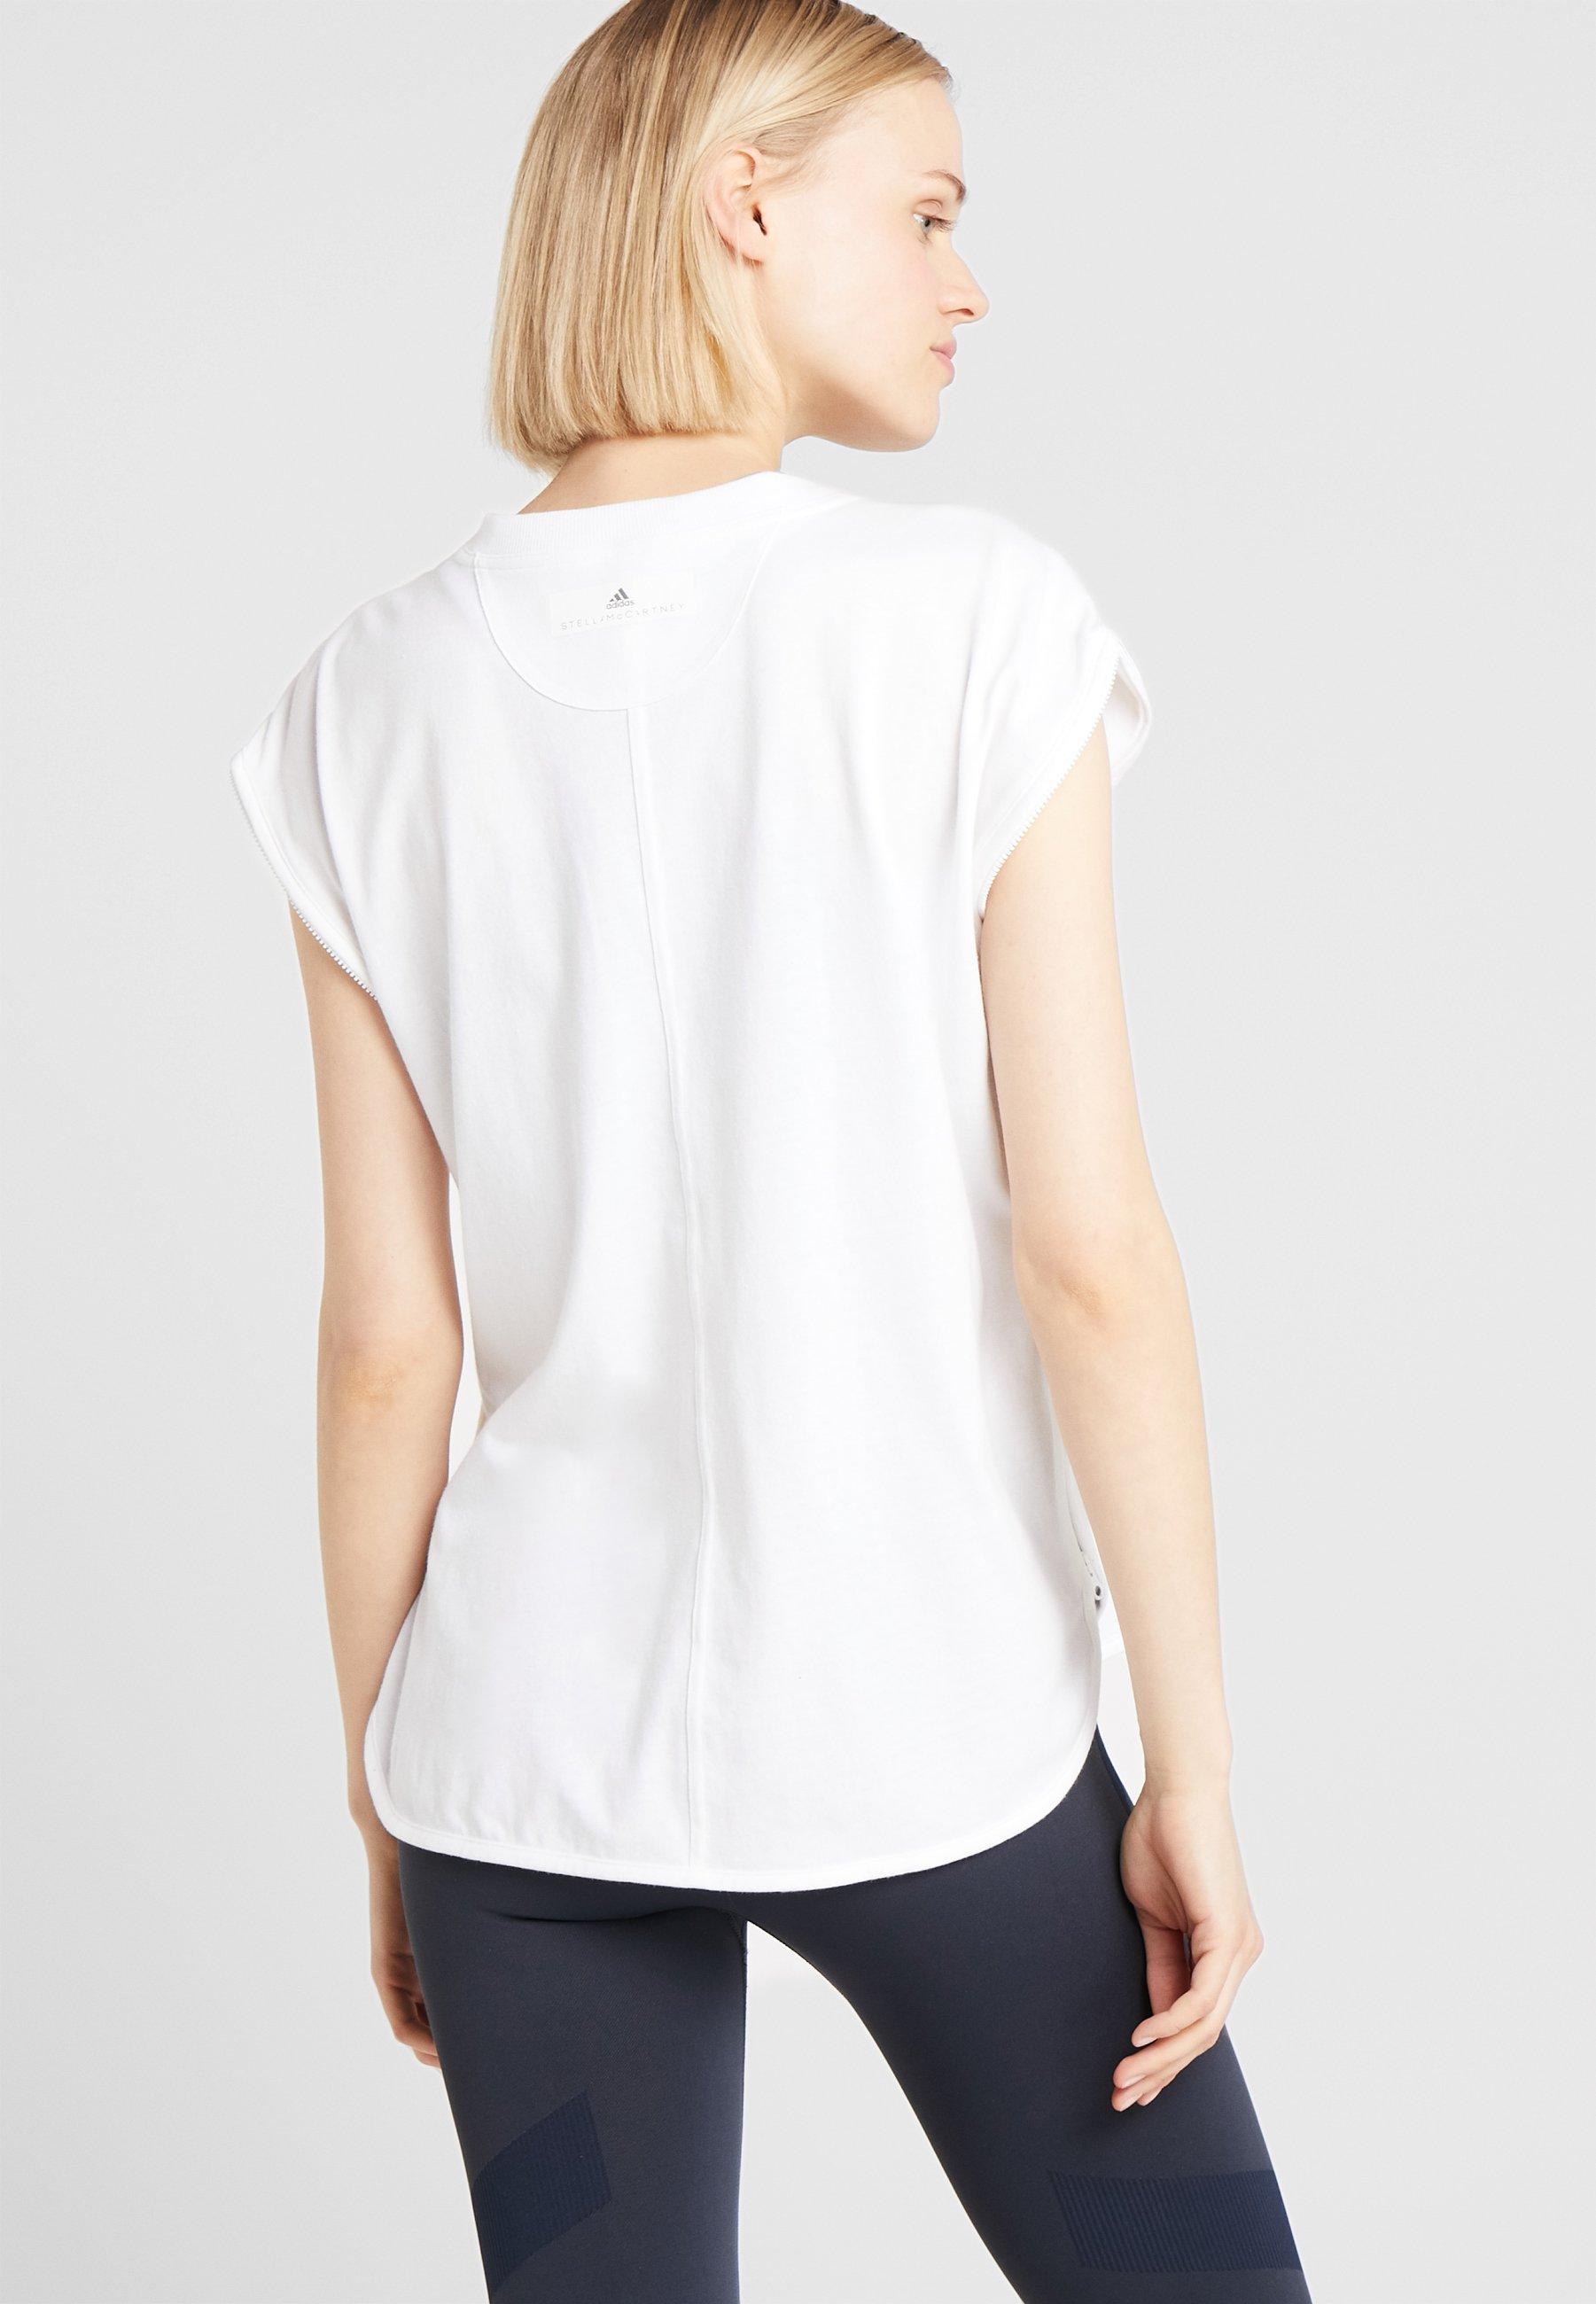 Imprimé White Adidas shirt GraphicT Stella Mccartney By L34q5jAR